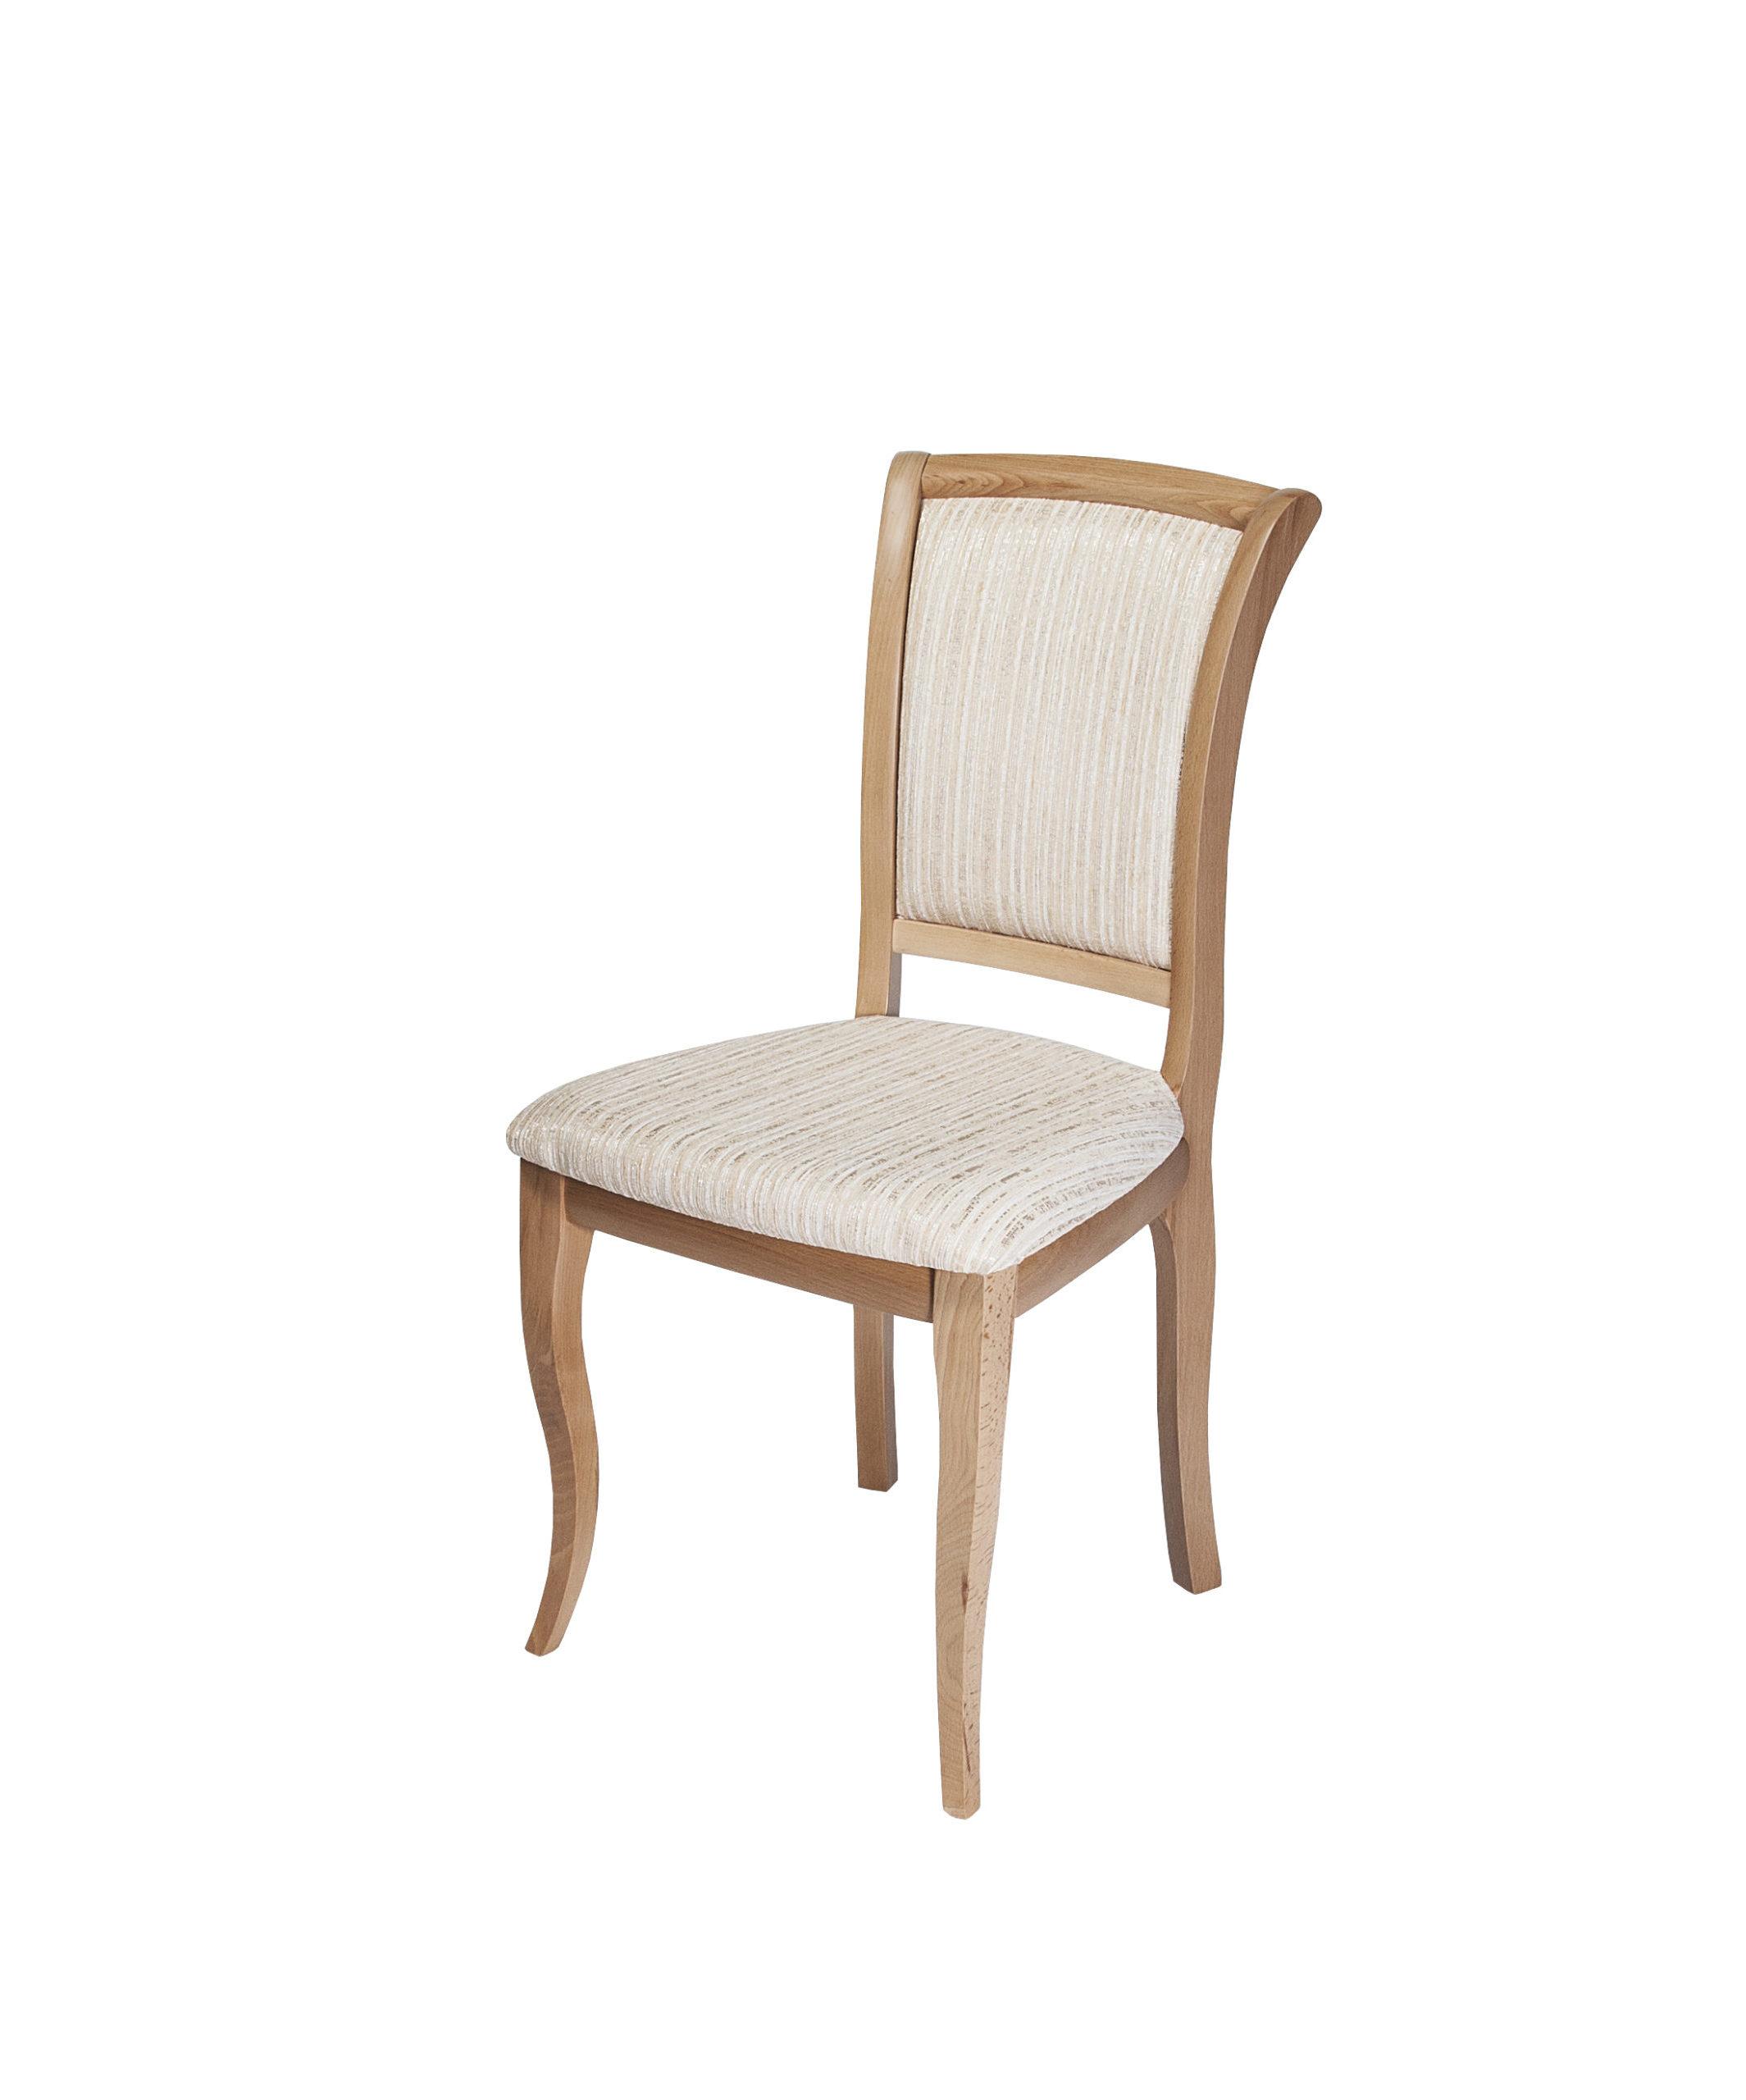 6399. Каркас стула из массива бука.